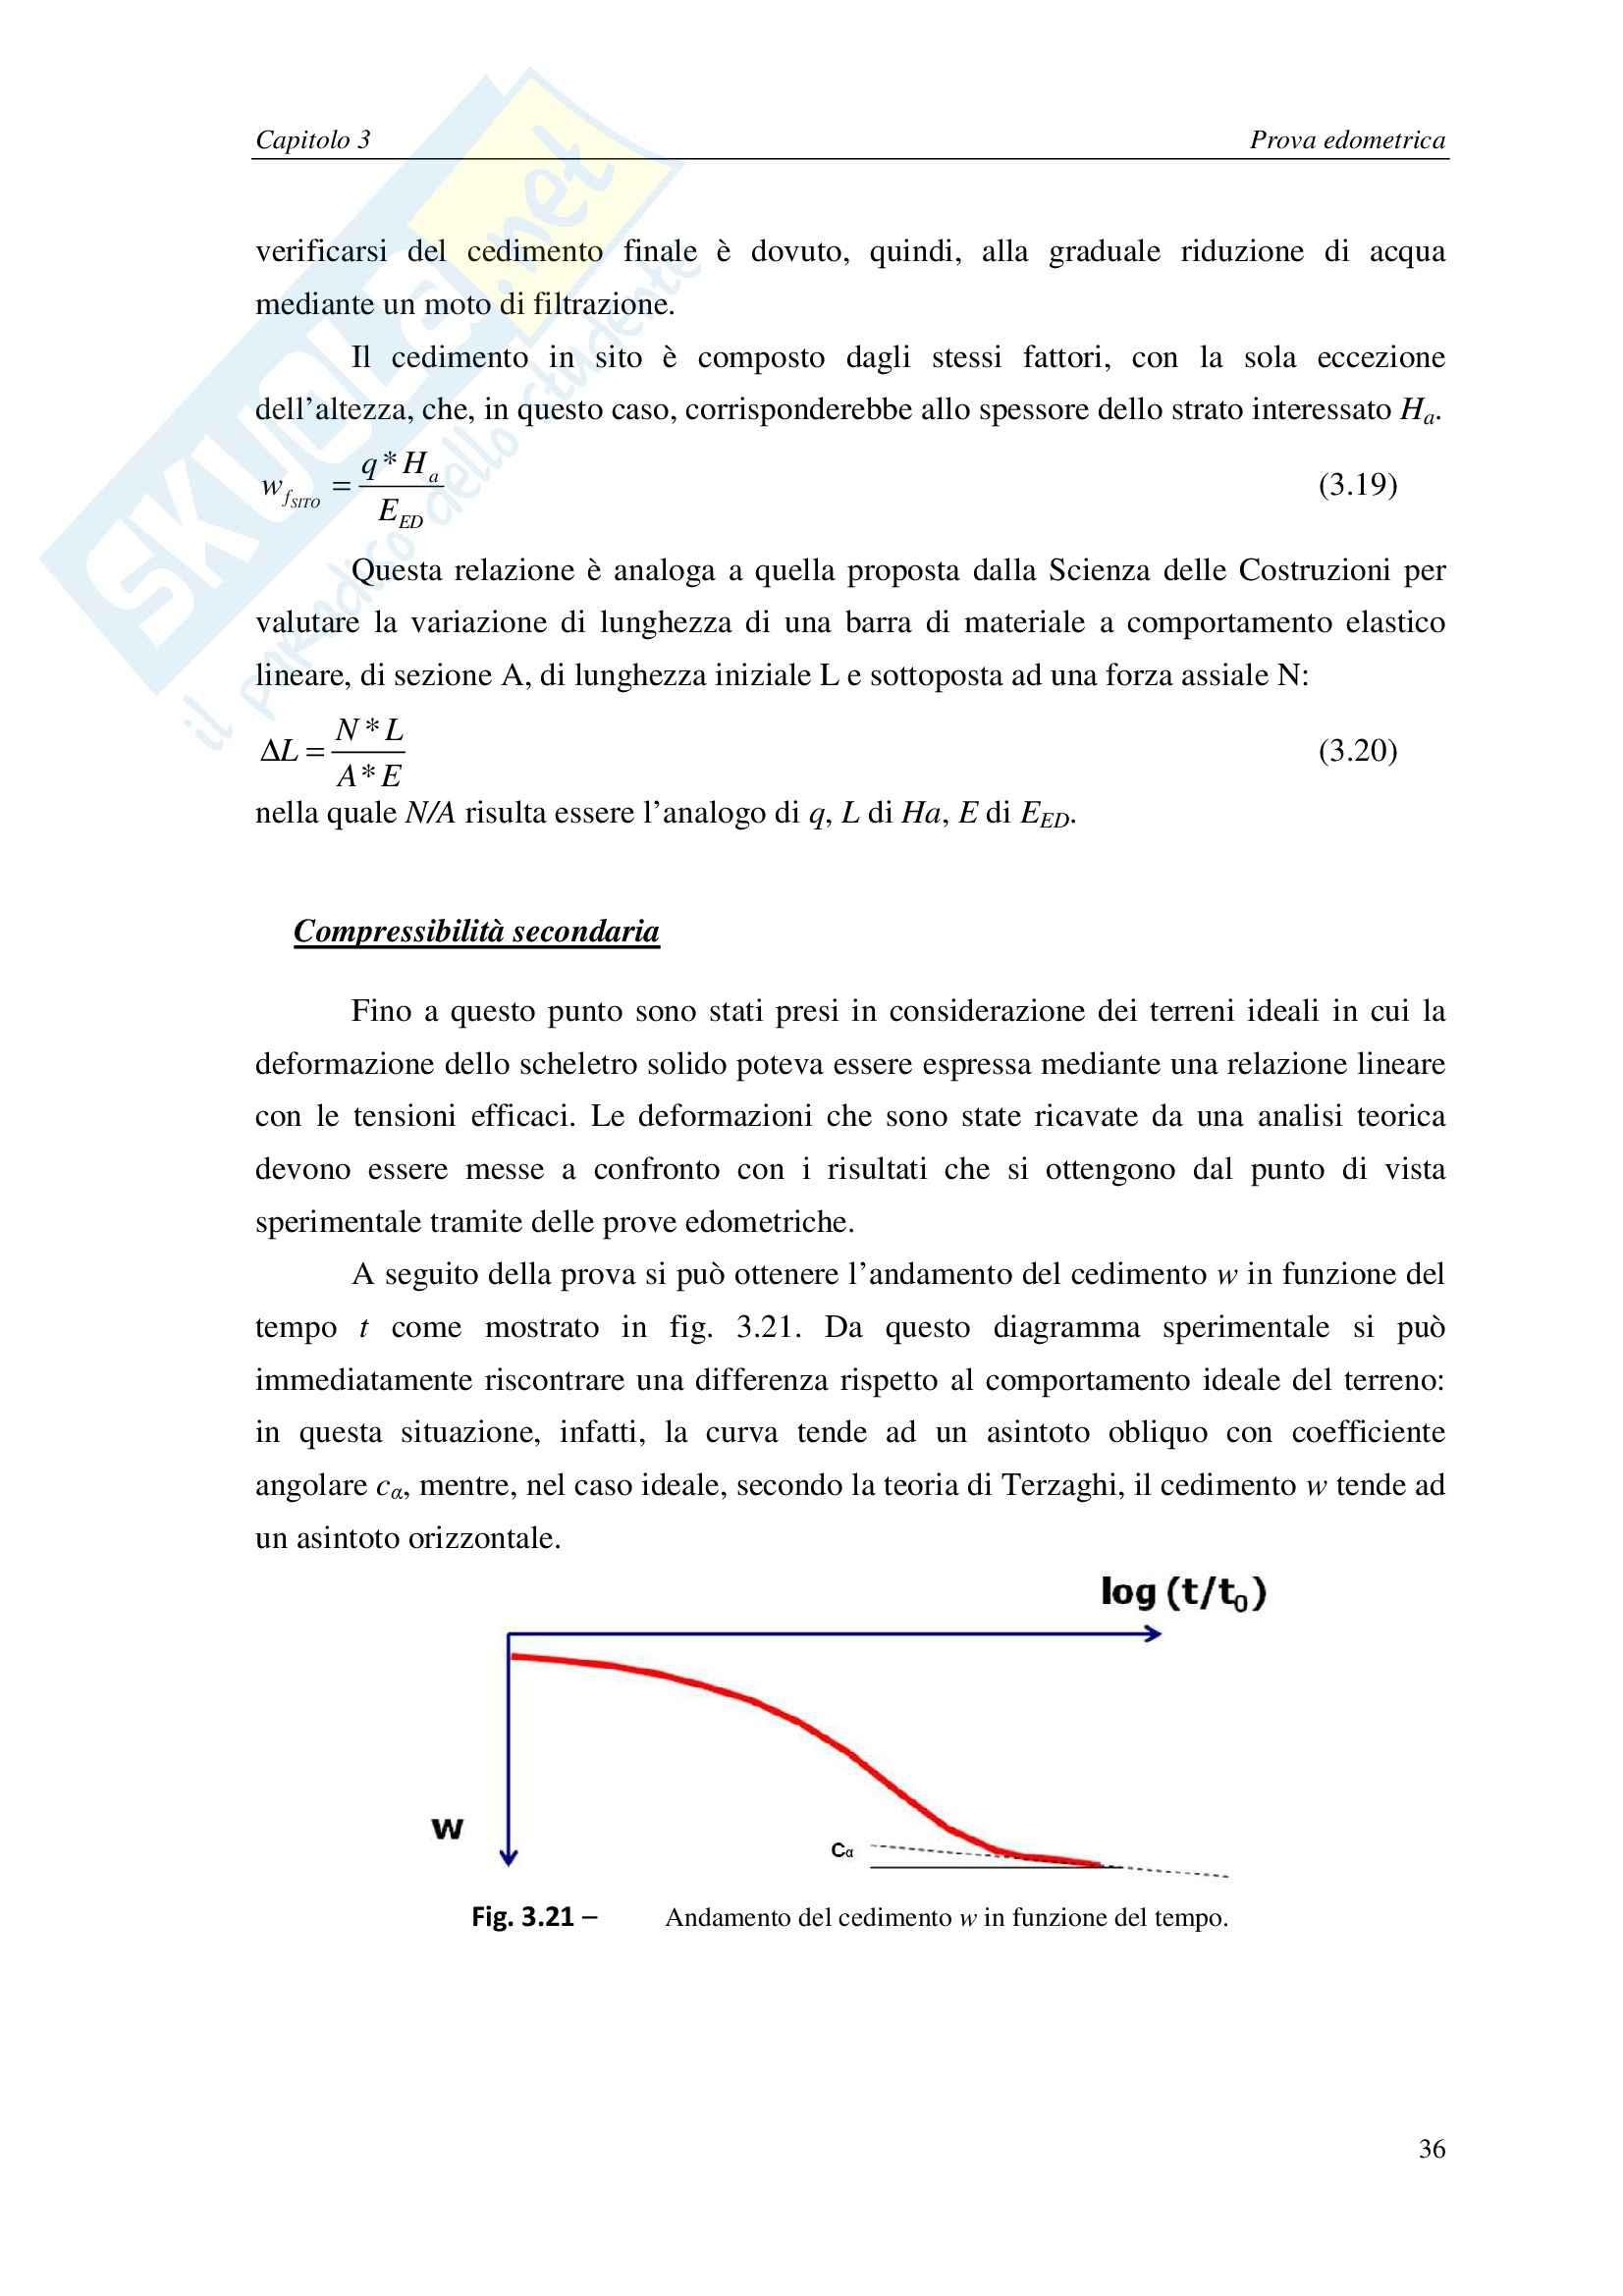 Tesi di Laurea Triennale - Prova Edometrica su Argilla Pag. 41